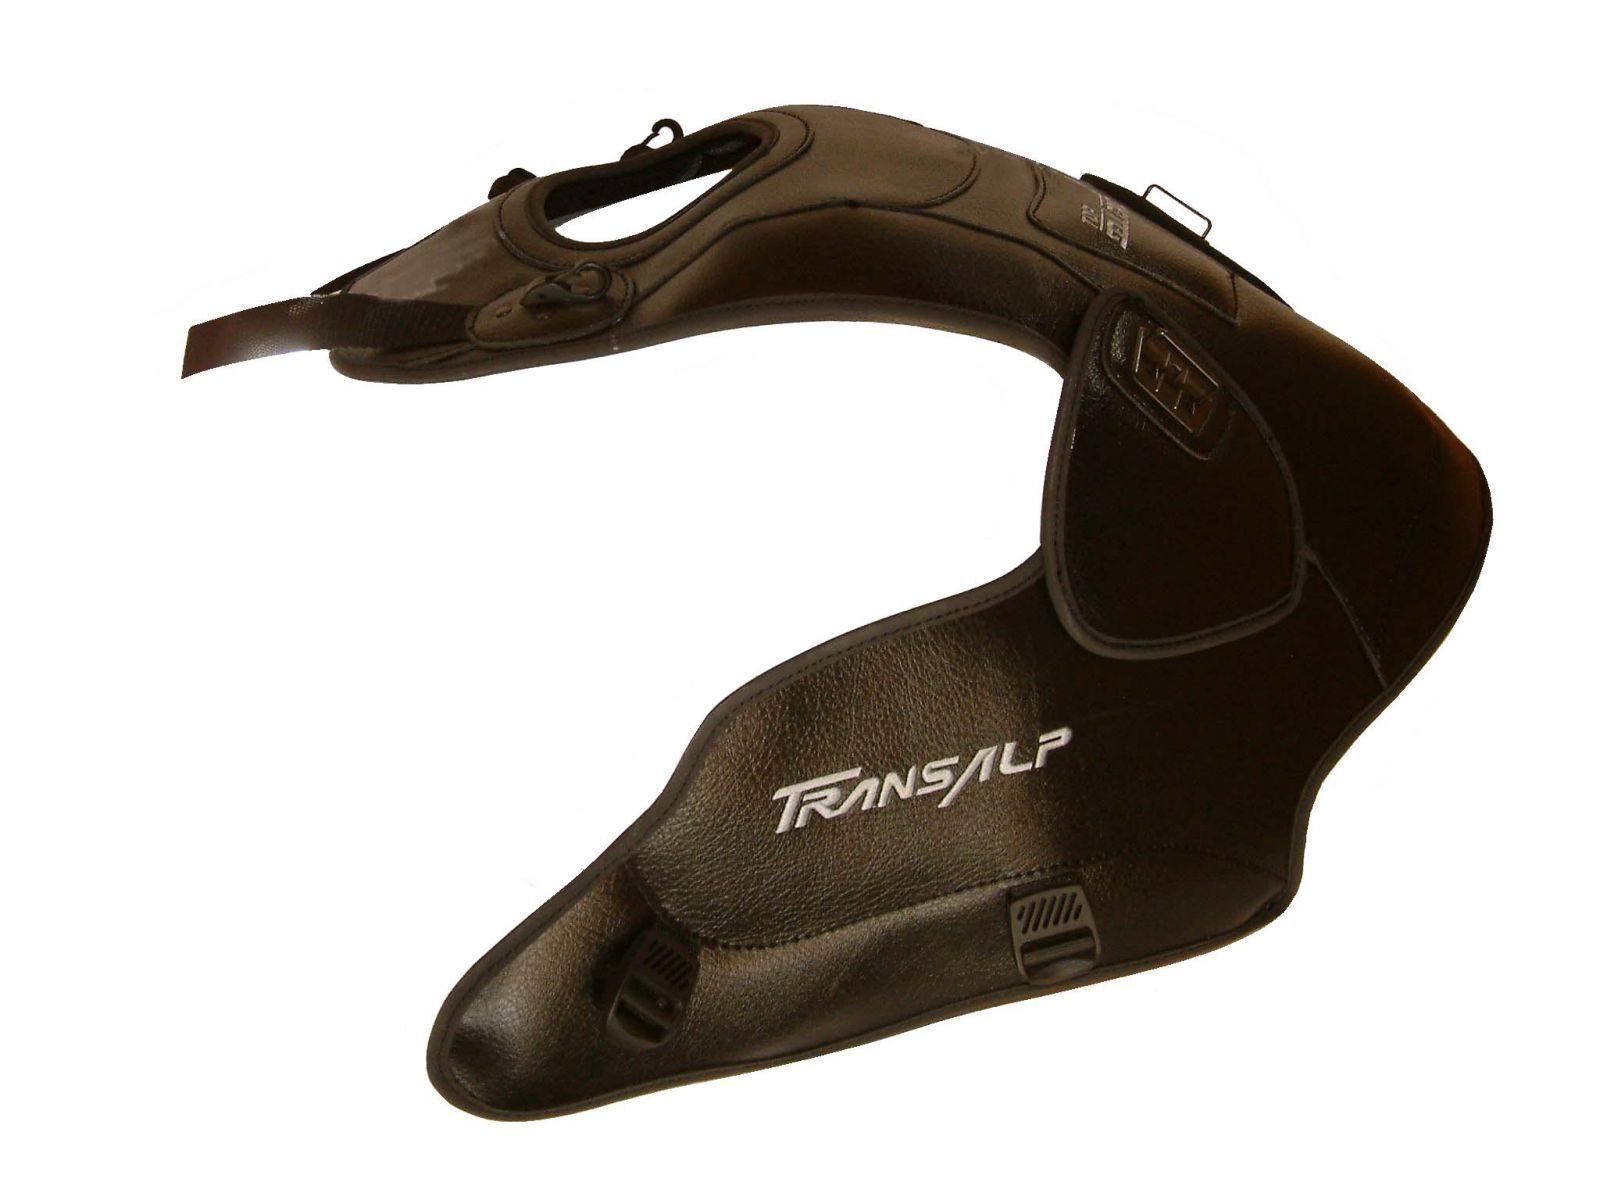 Capa de depósito TPR6034 - HONDA TRANSALP XL 700 V [≥ 2008]